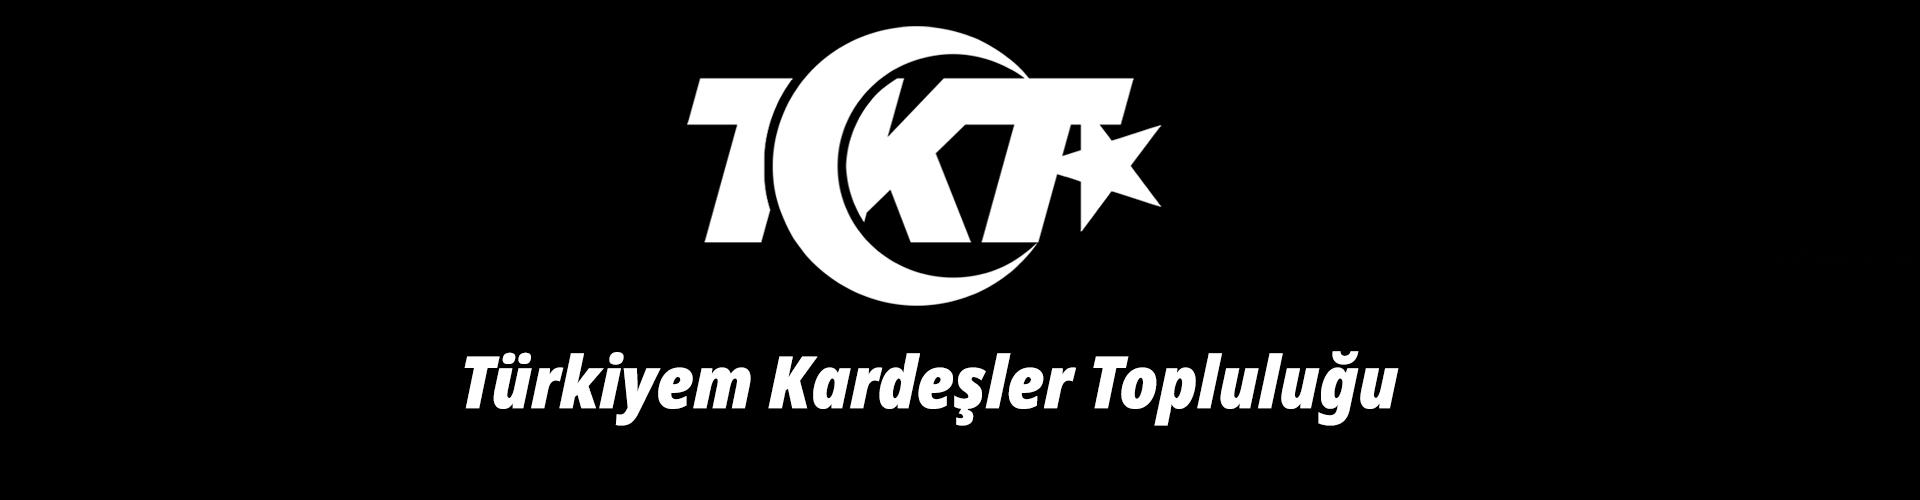 TKT 18 Mart Canakkale Şehitlerini Anma Konvoyu